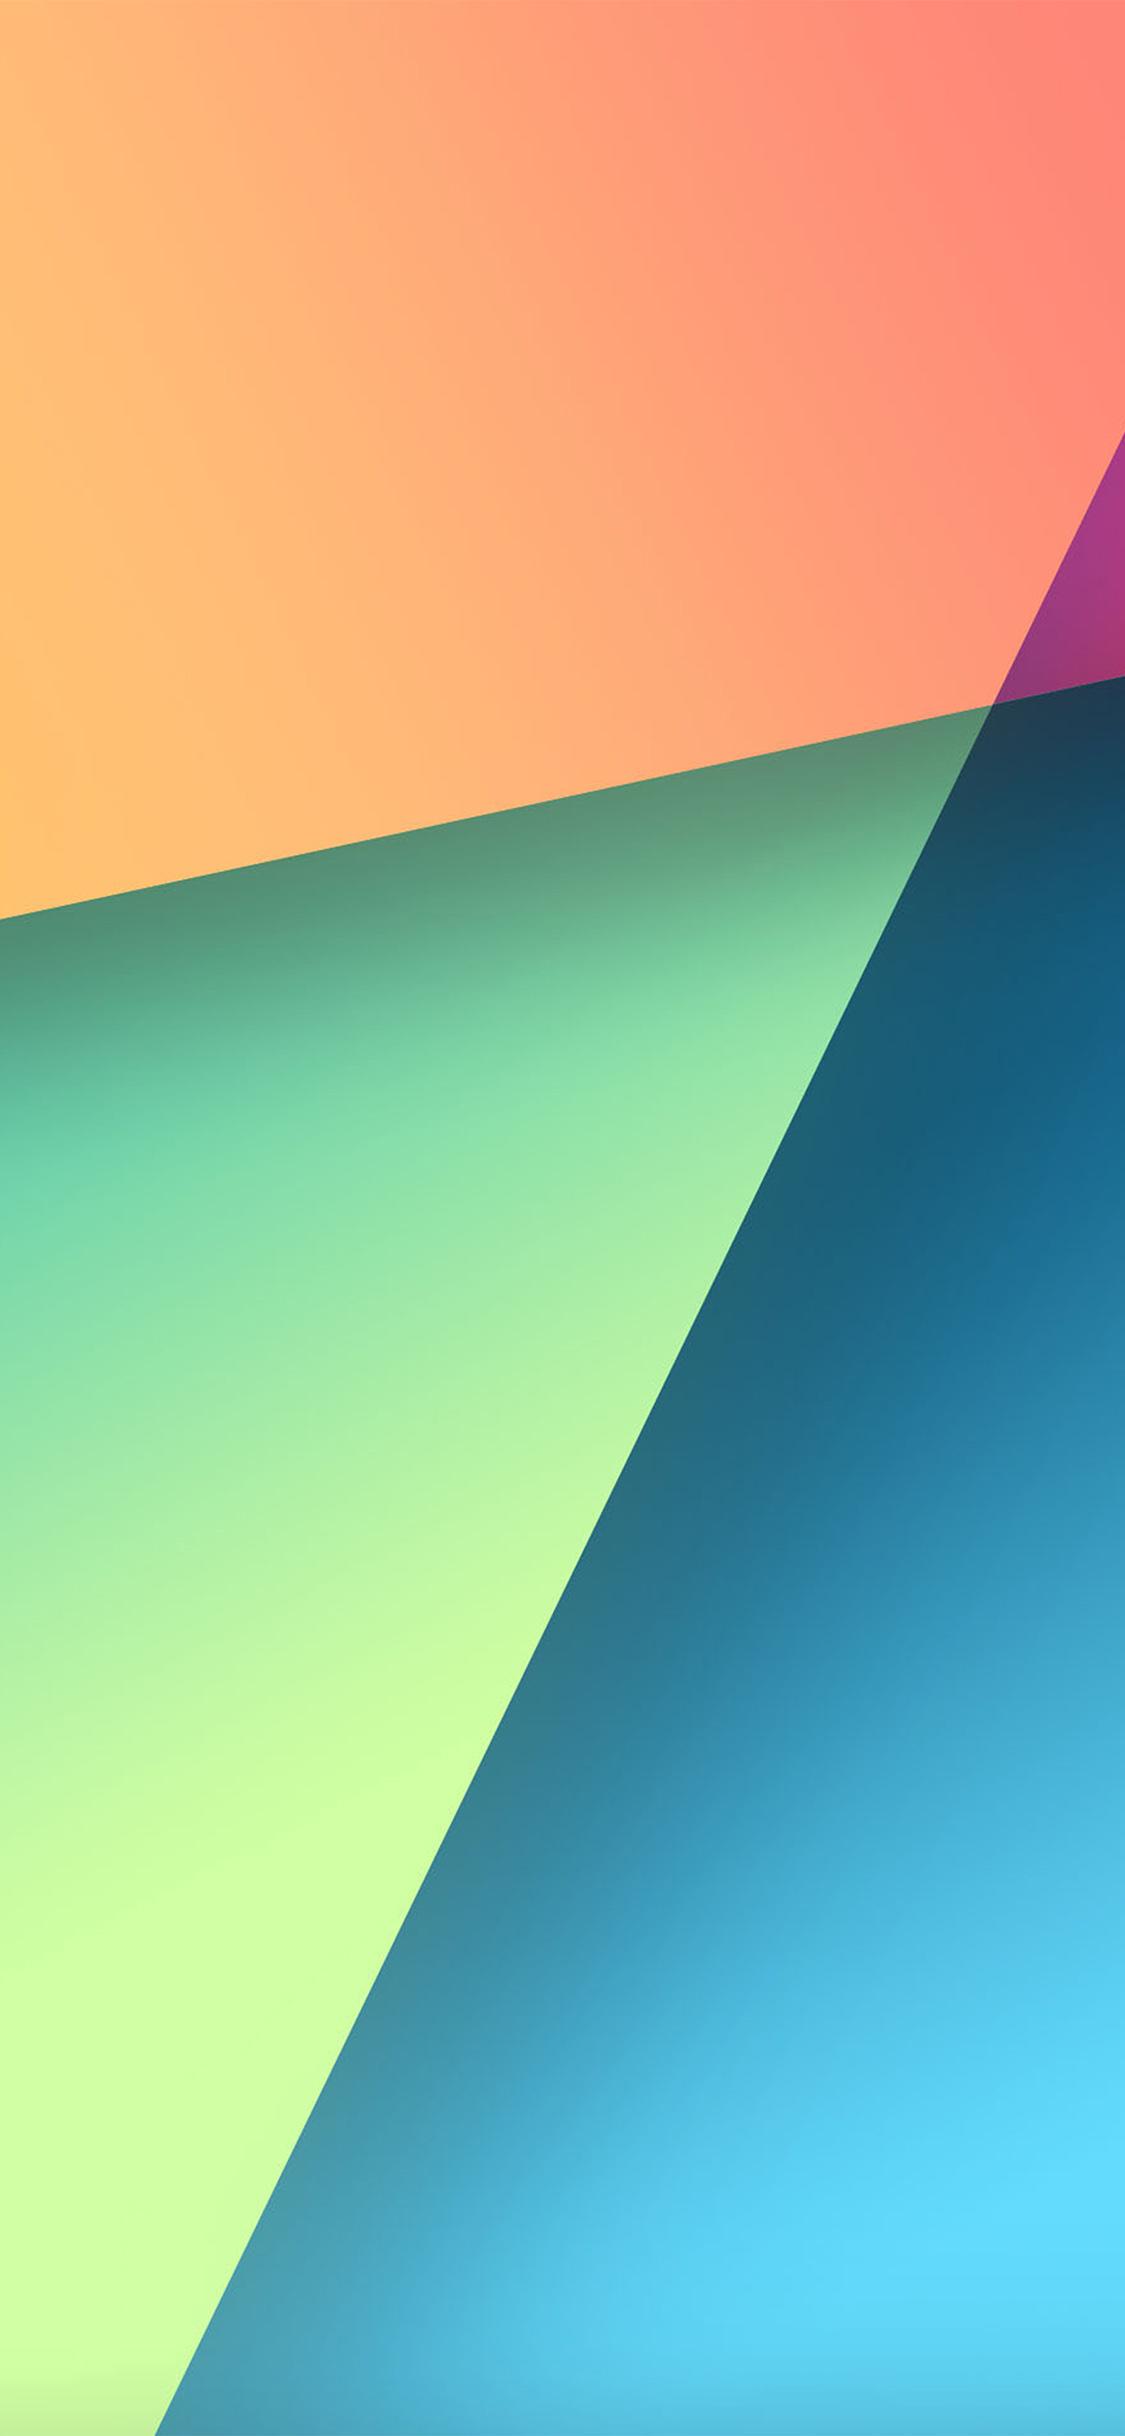 Naranja Fondo De Pantalla De Android Lollipop 1125x2436 Wallpapertip